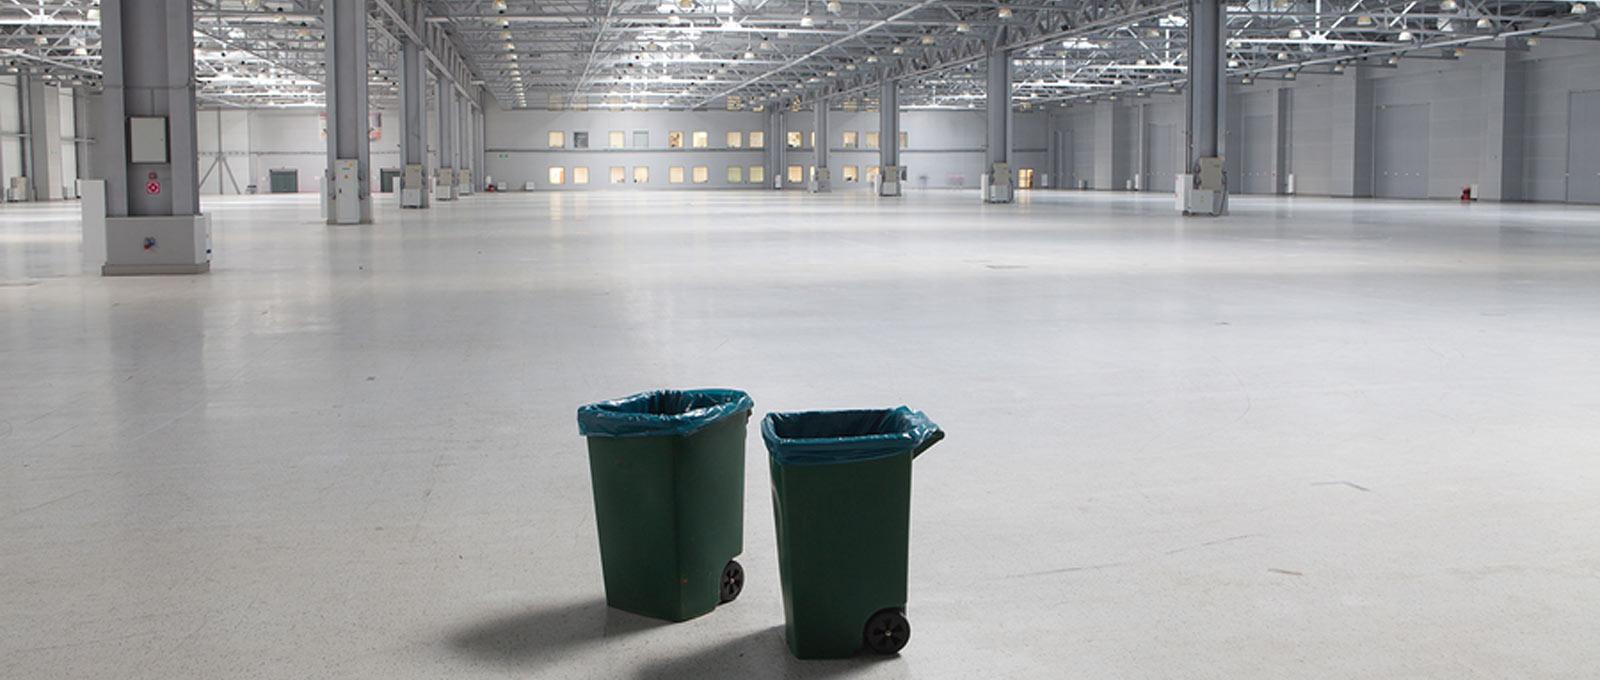 Callaway industrial services industrial cleaning for Industrial concrete floor cleaning services